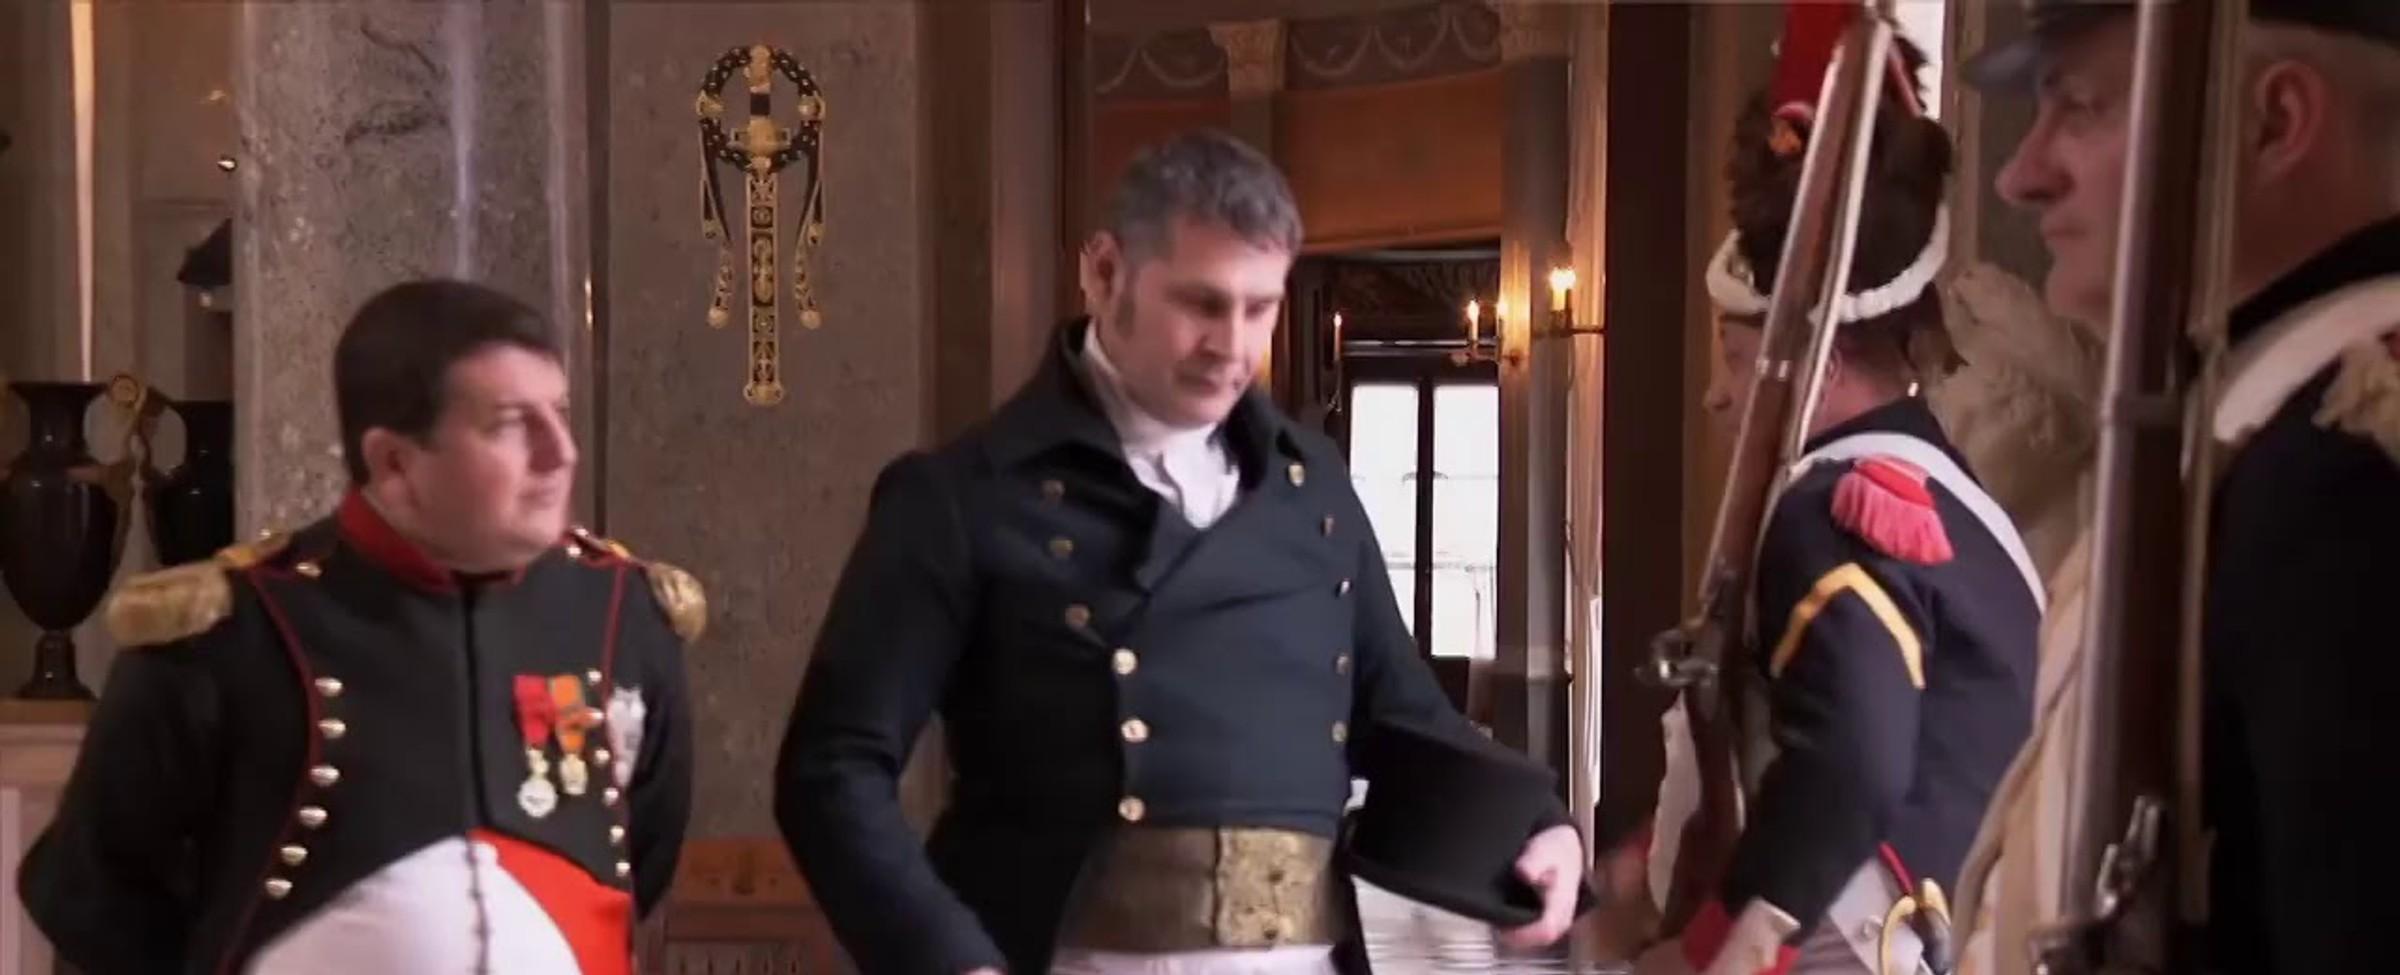 Napoleonova cesta do Ameriky